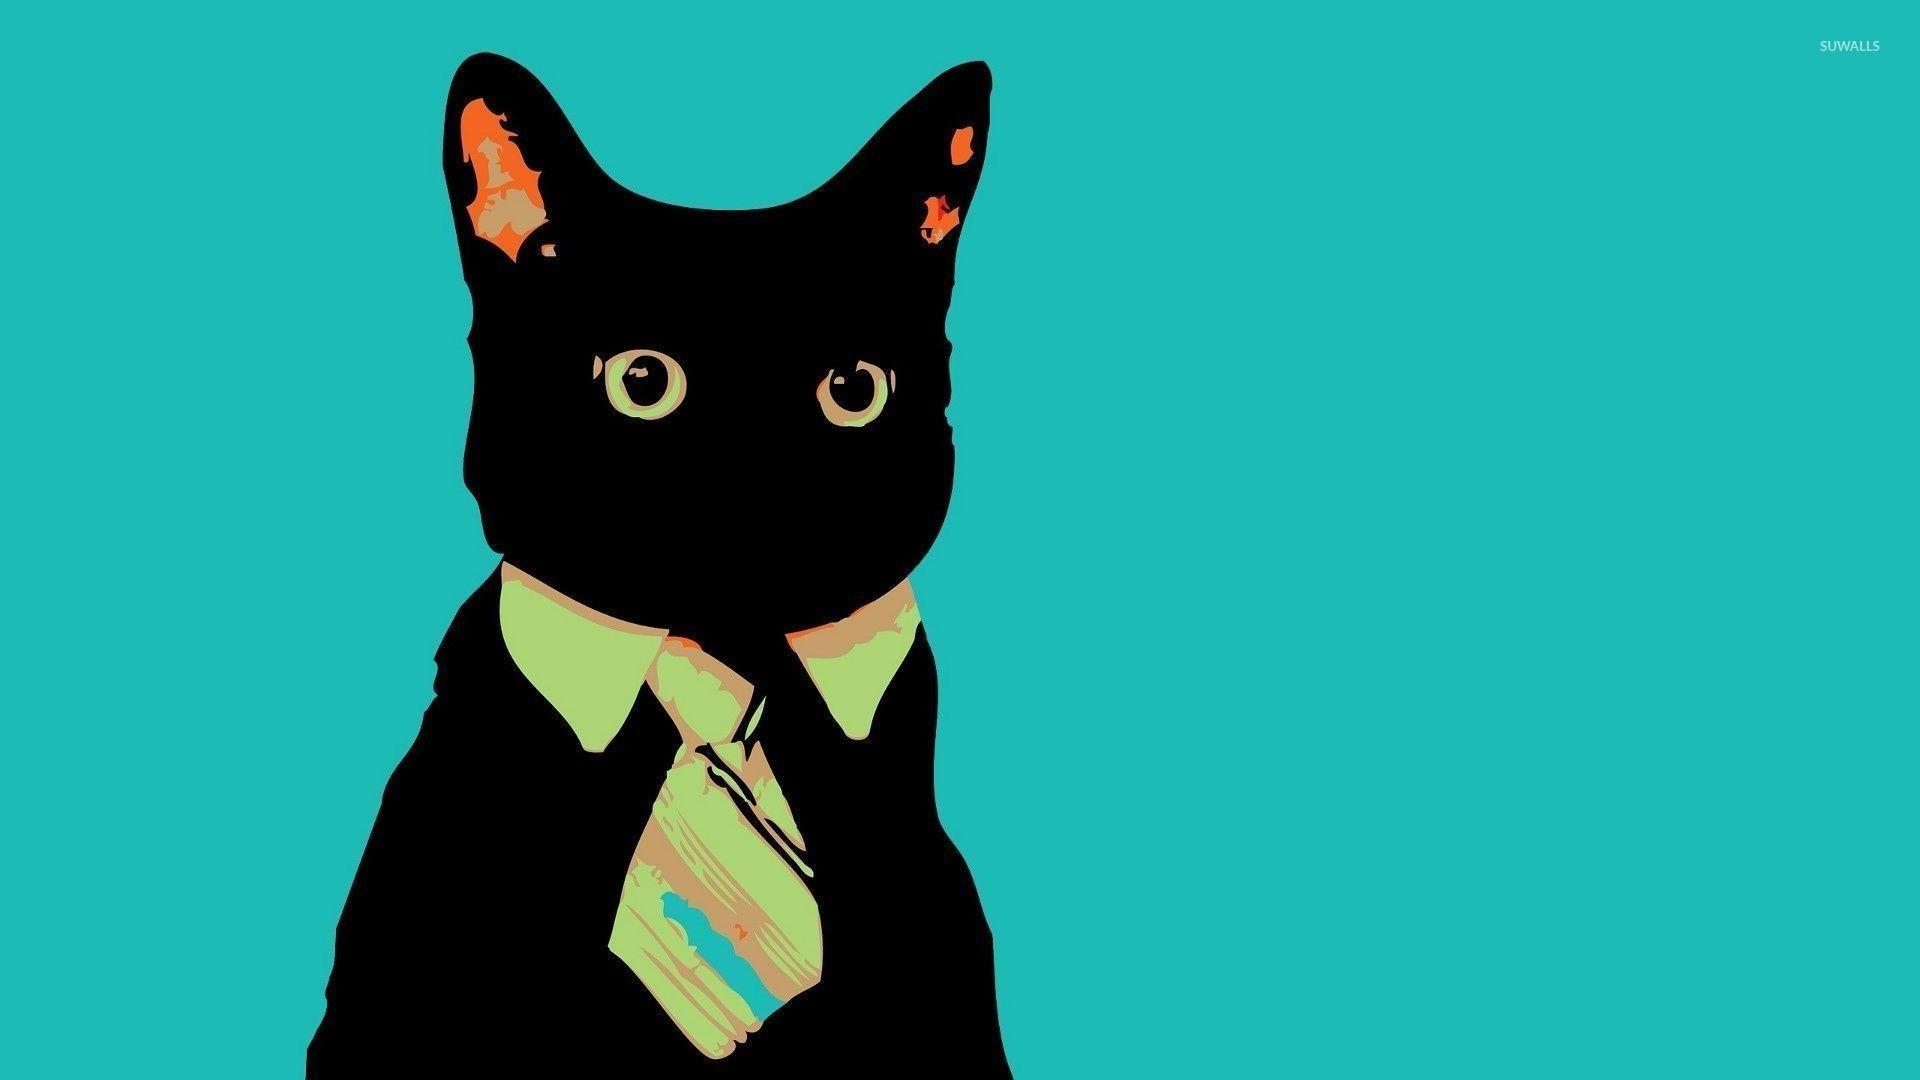 Black Cat With A Tie Wallpaper Digital Art Wallpapers